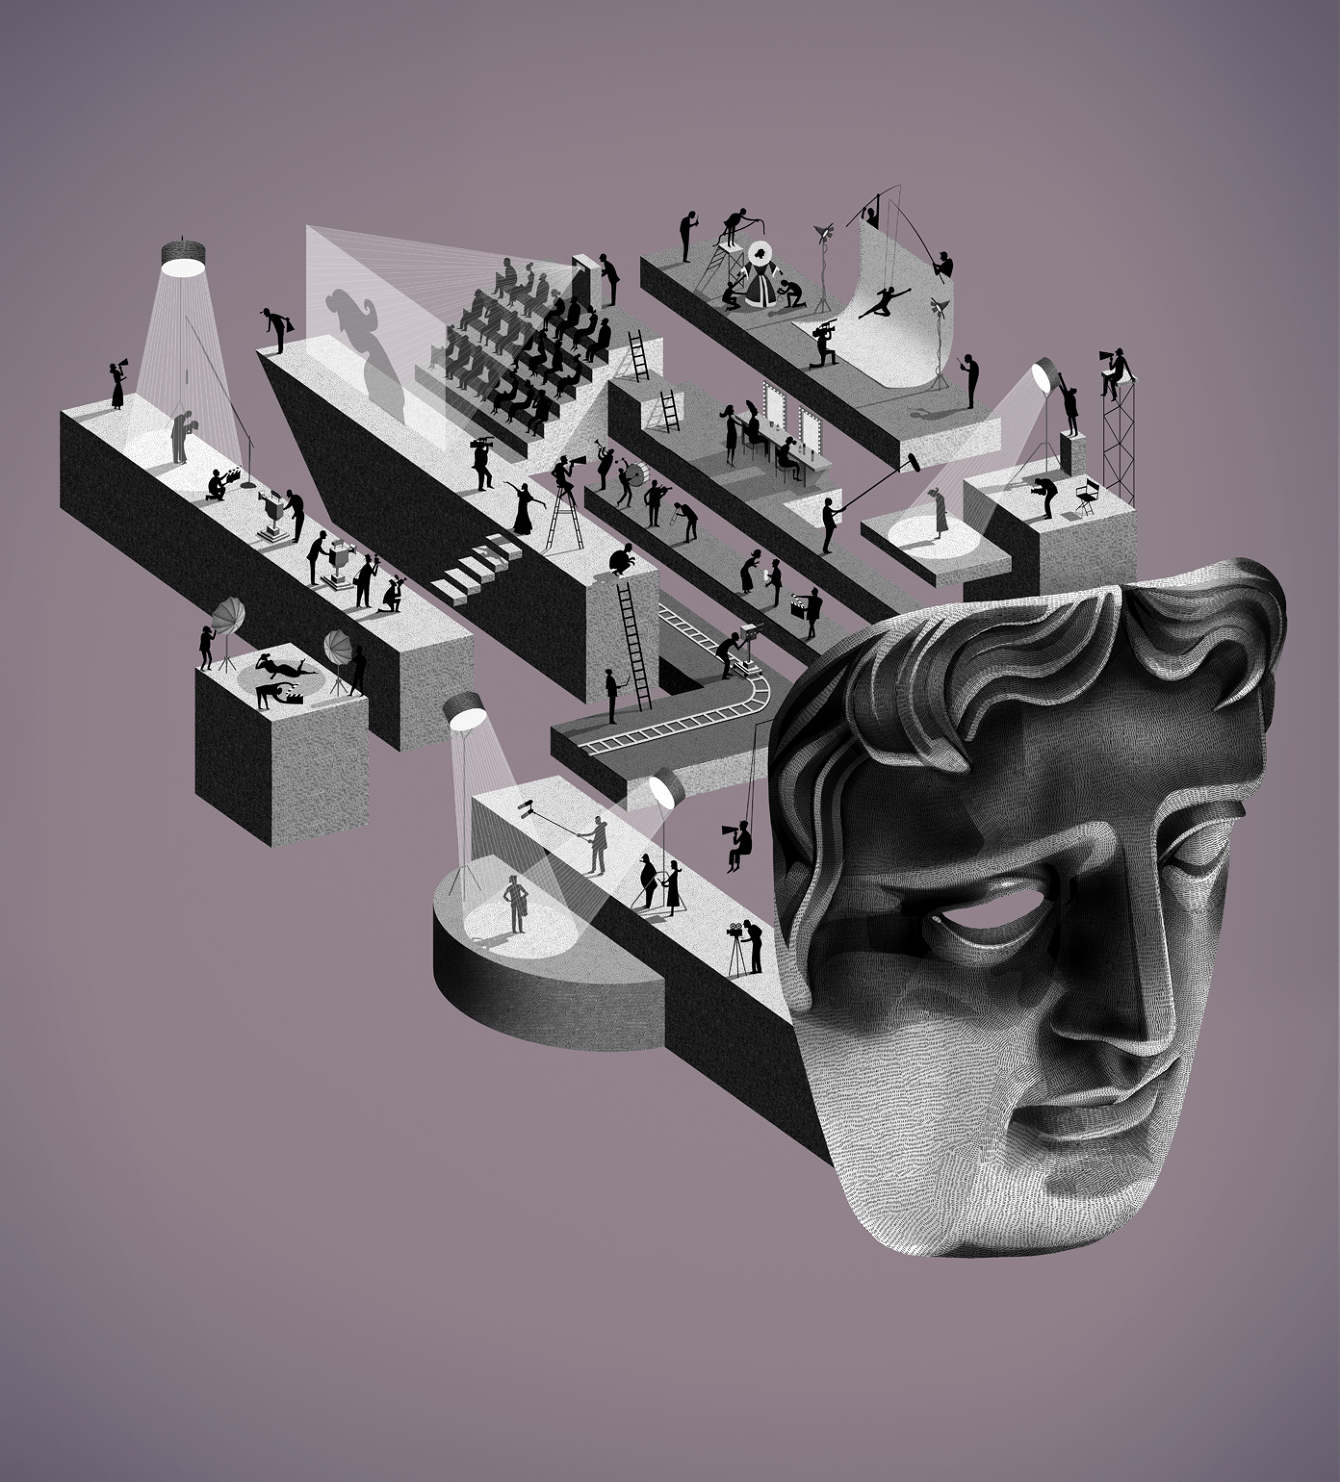 Adam Simpson's BAFTA mask illustration